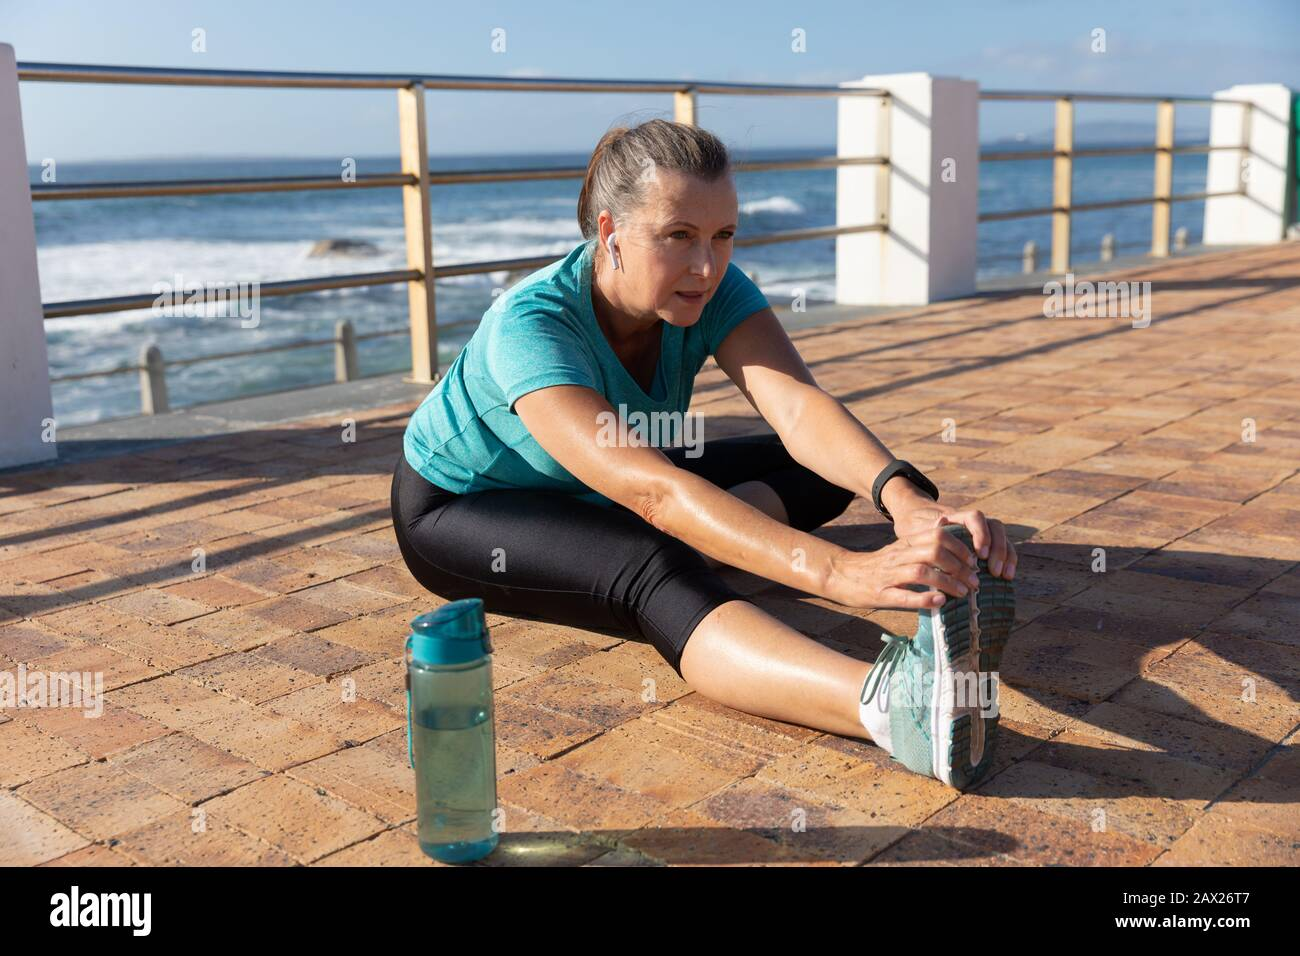 Weibliche Joggerin am Meer Stockfoto